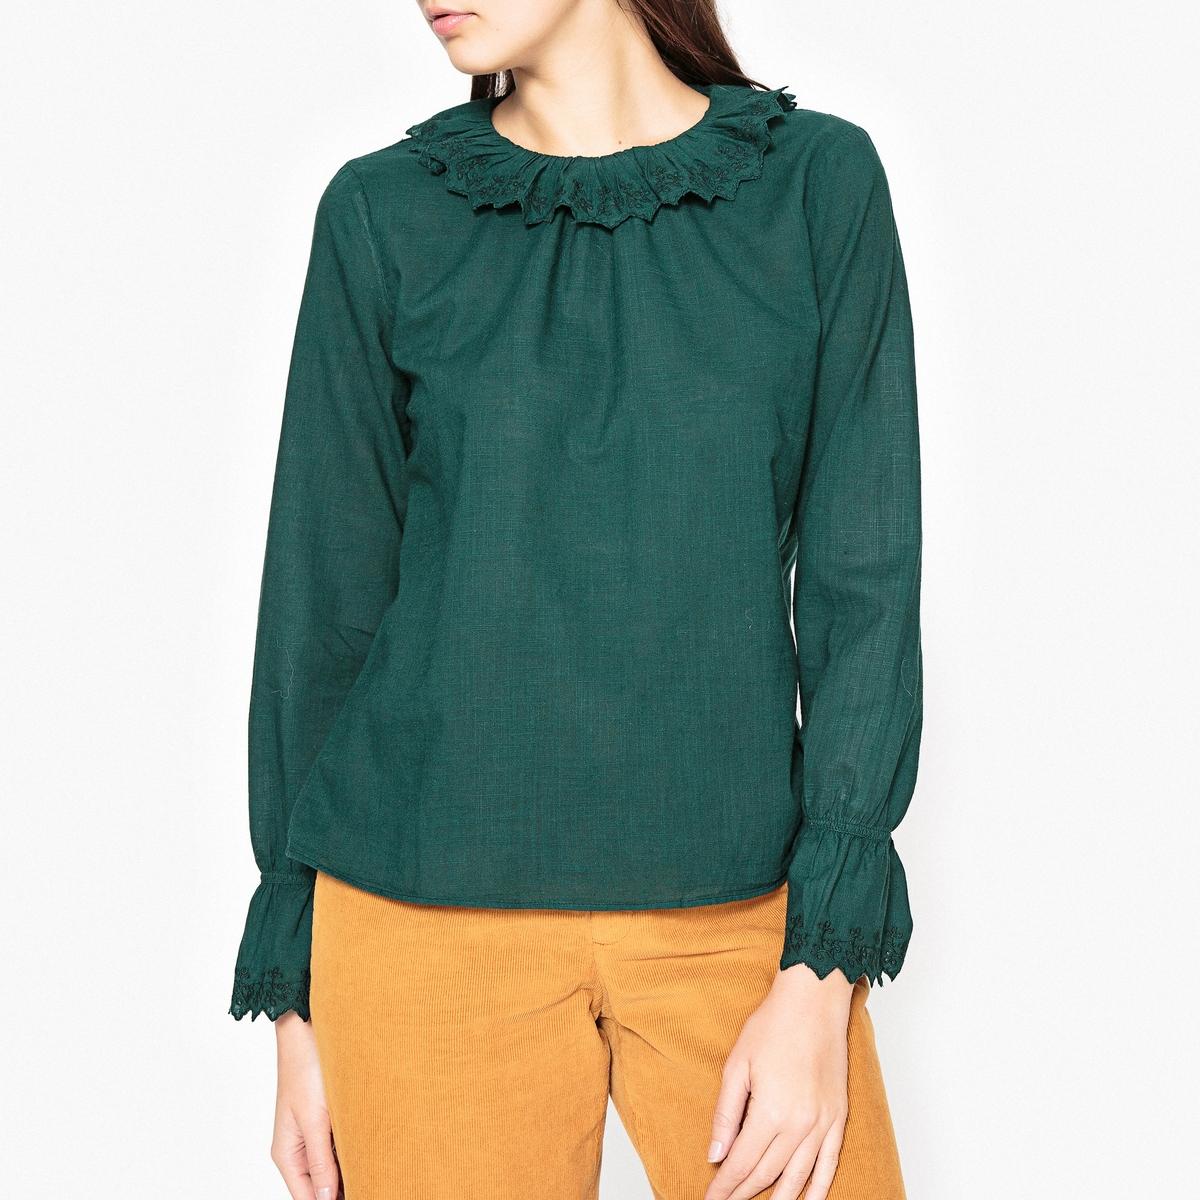 Блузка с воланами CASSIEN блузка асимметричная с воланами на рукаве